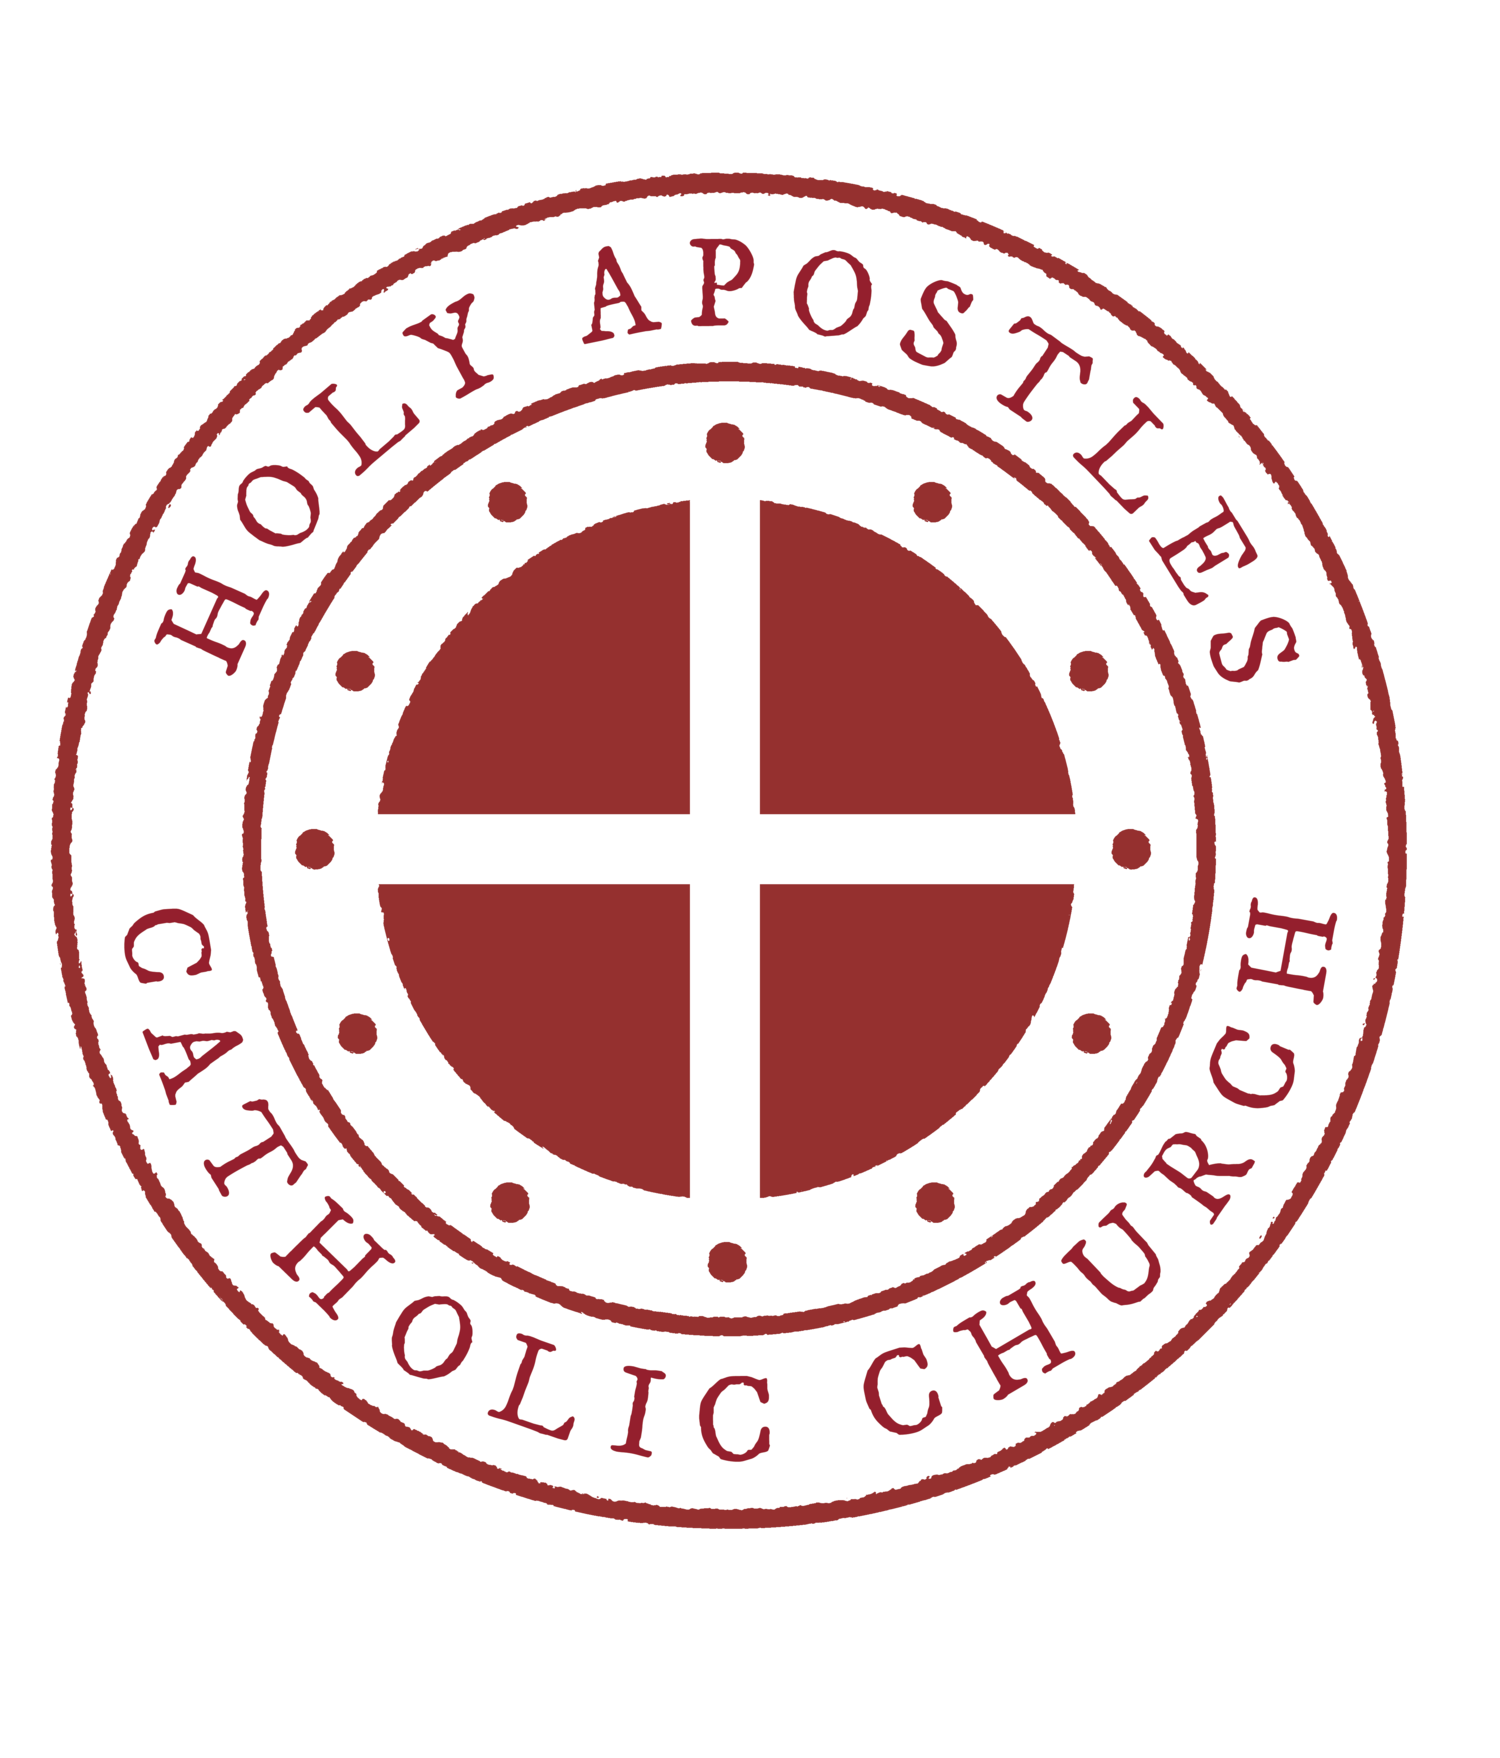 Reconciliation Holy Apostles Catholic Church Preschool